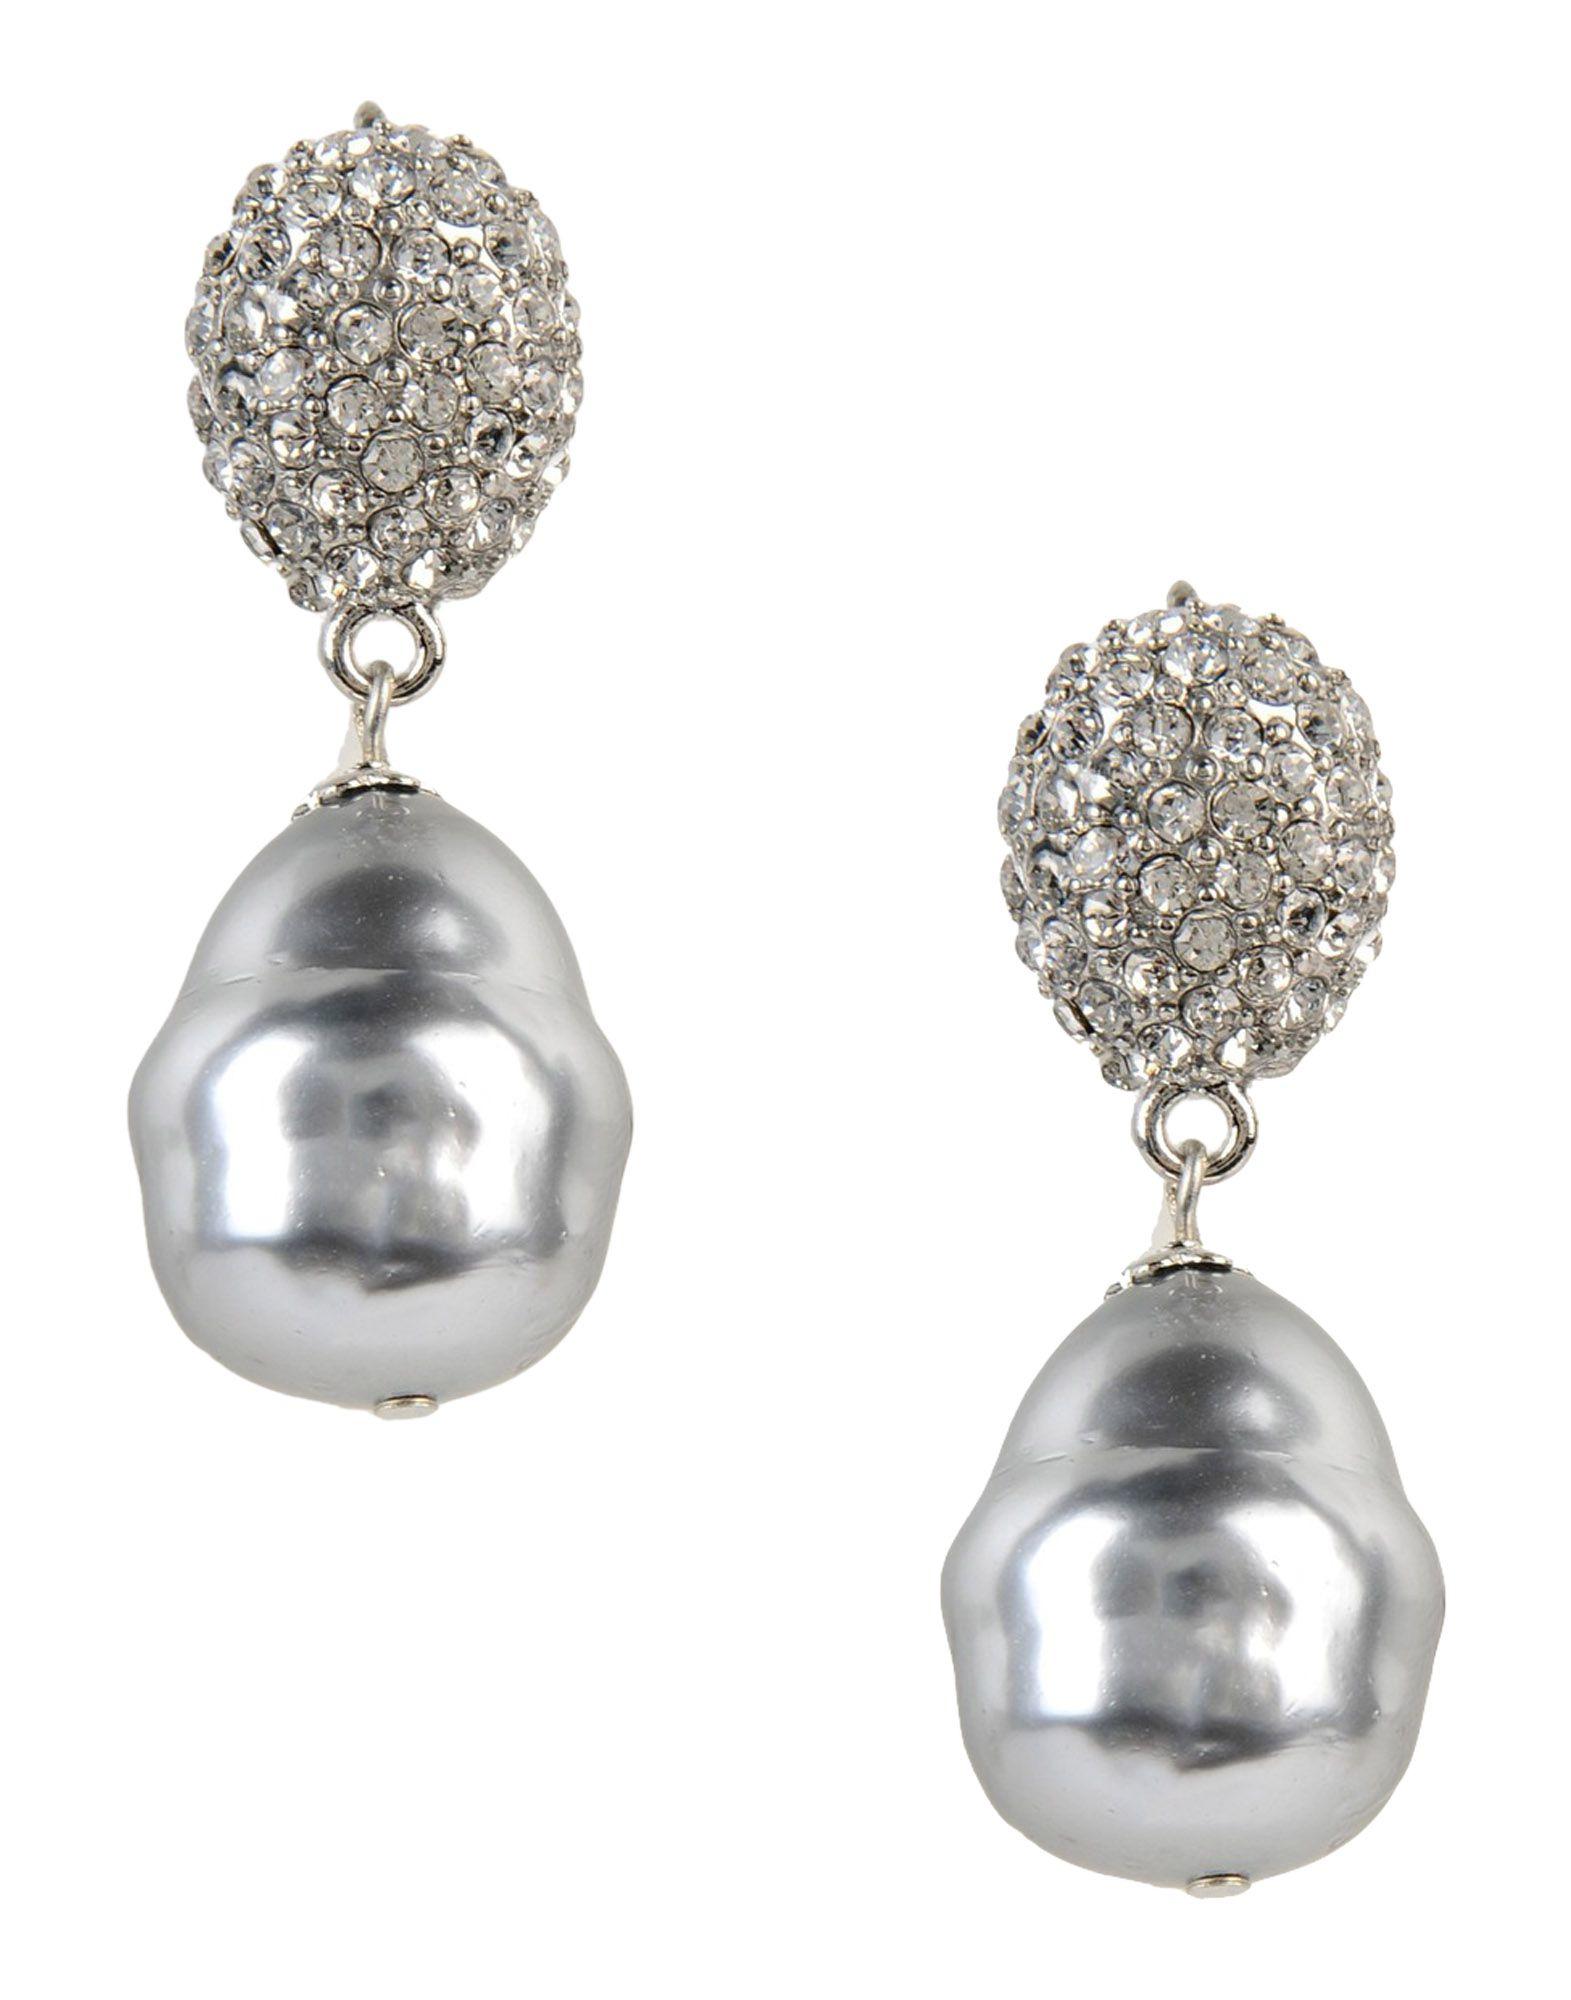 lyst kenneth jay lane earrings in metallic. Black Bedroom Furniture Sets. Home Design Ideas